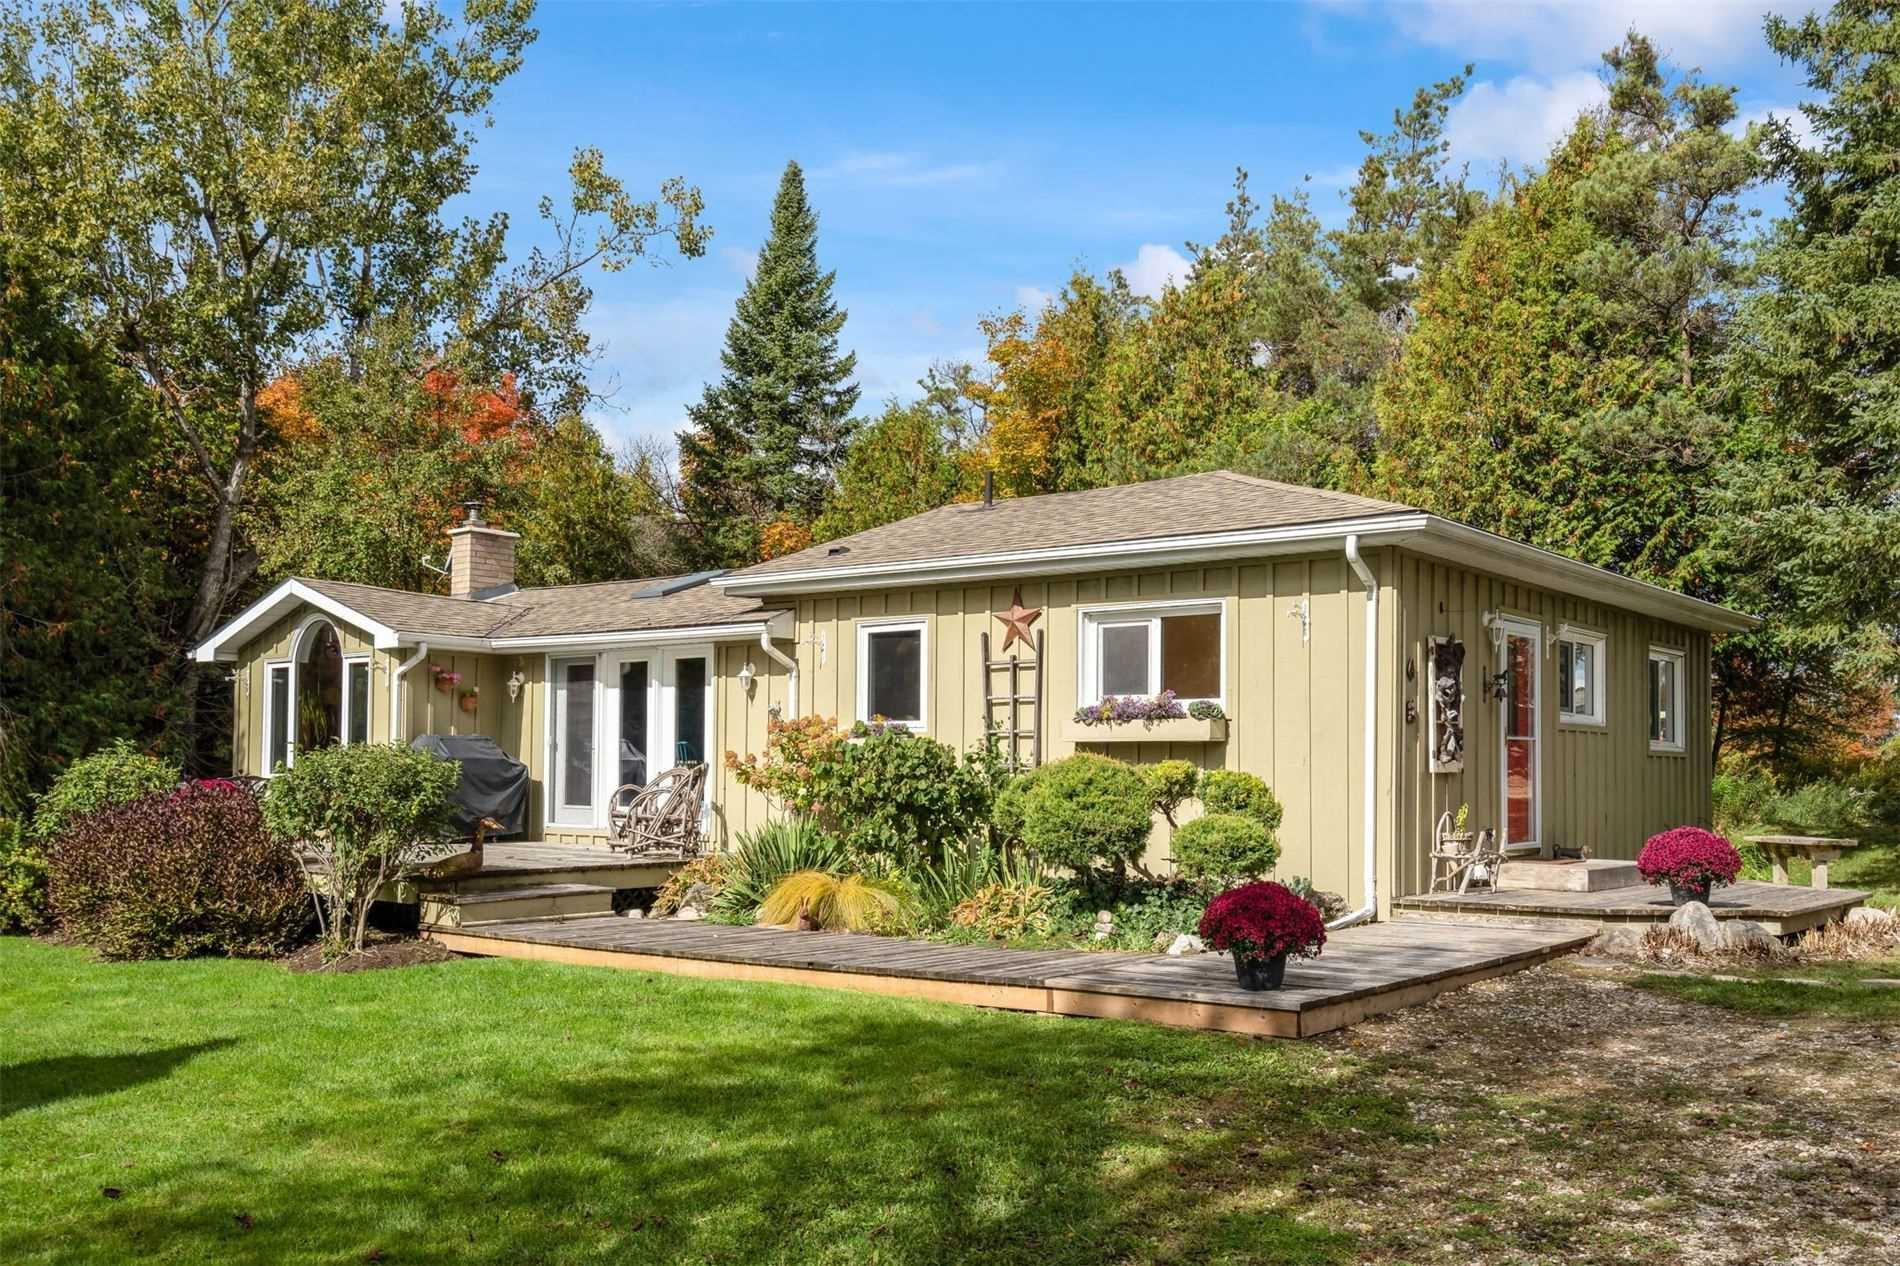 Main Photo: 596302 2nd Line W in Mulmur: Rural Mulmur House (Bungalow) for sale : MLS®# X4944153